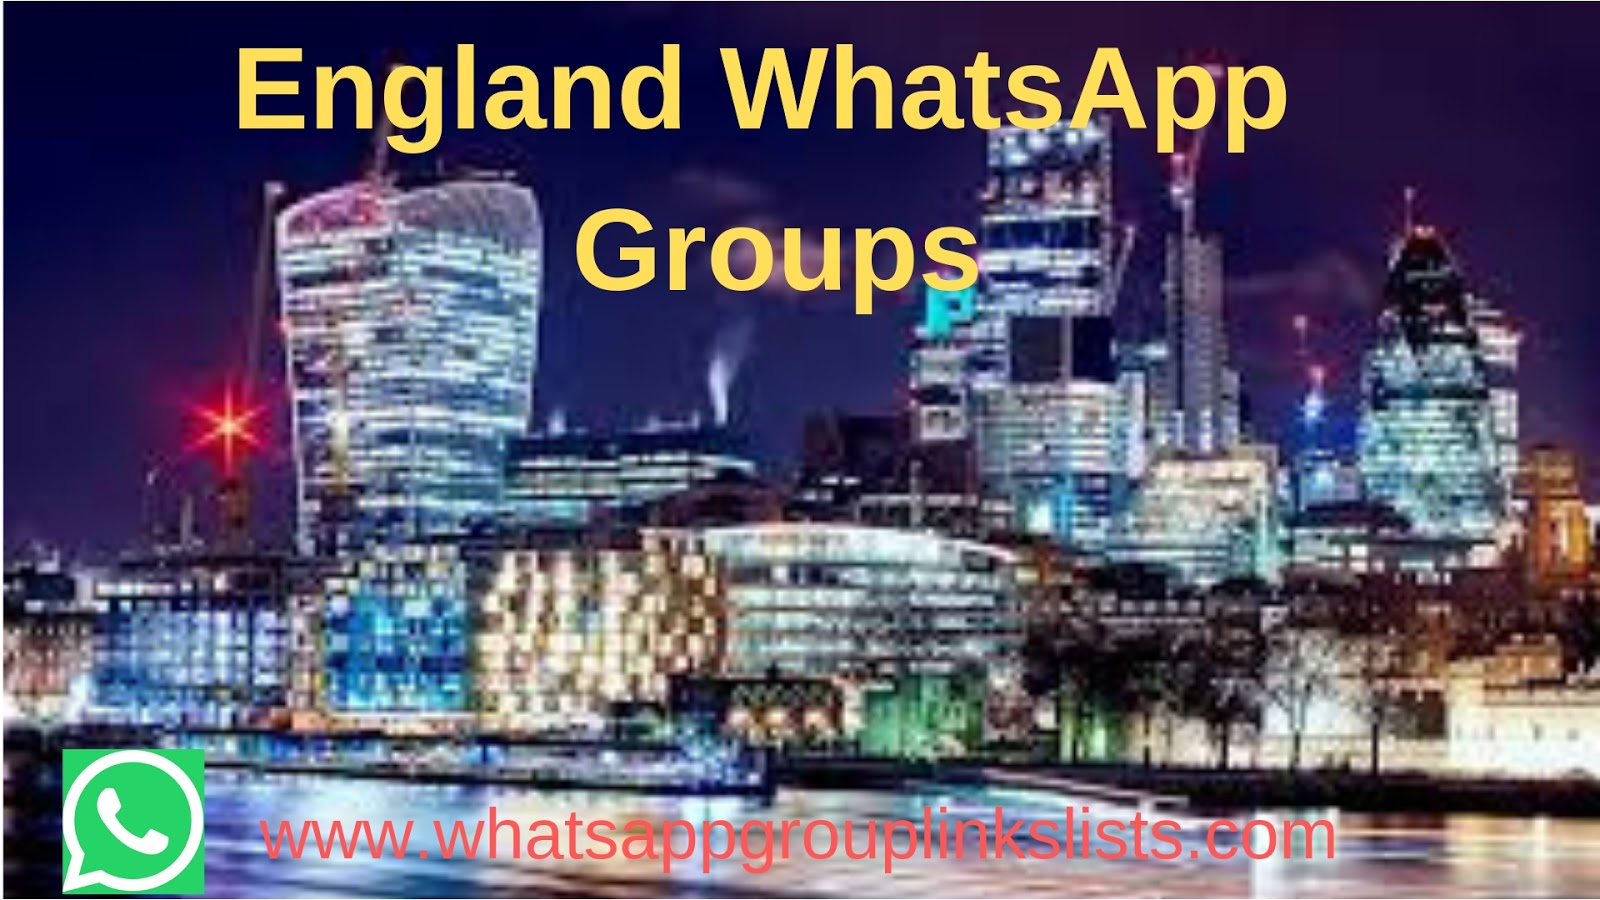 Join England WhatsApp Group Links list